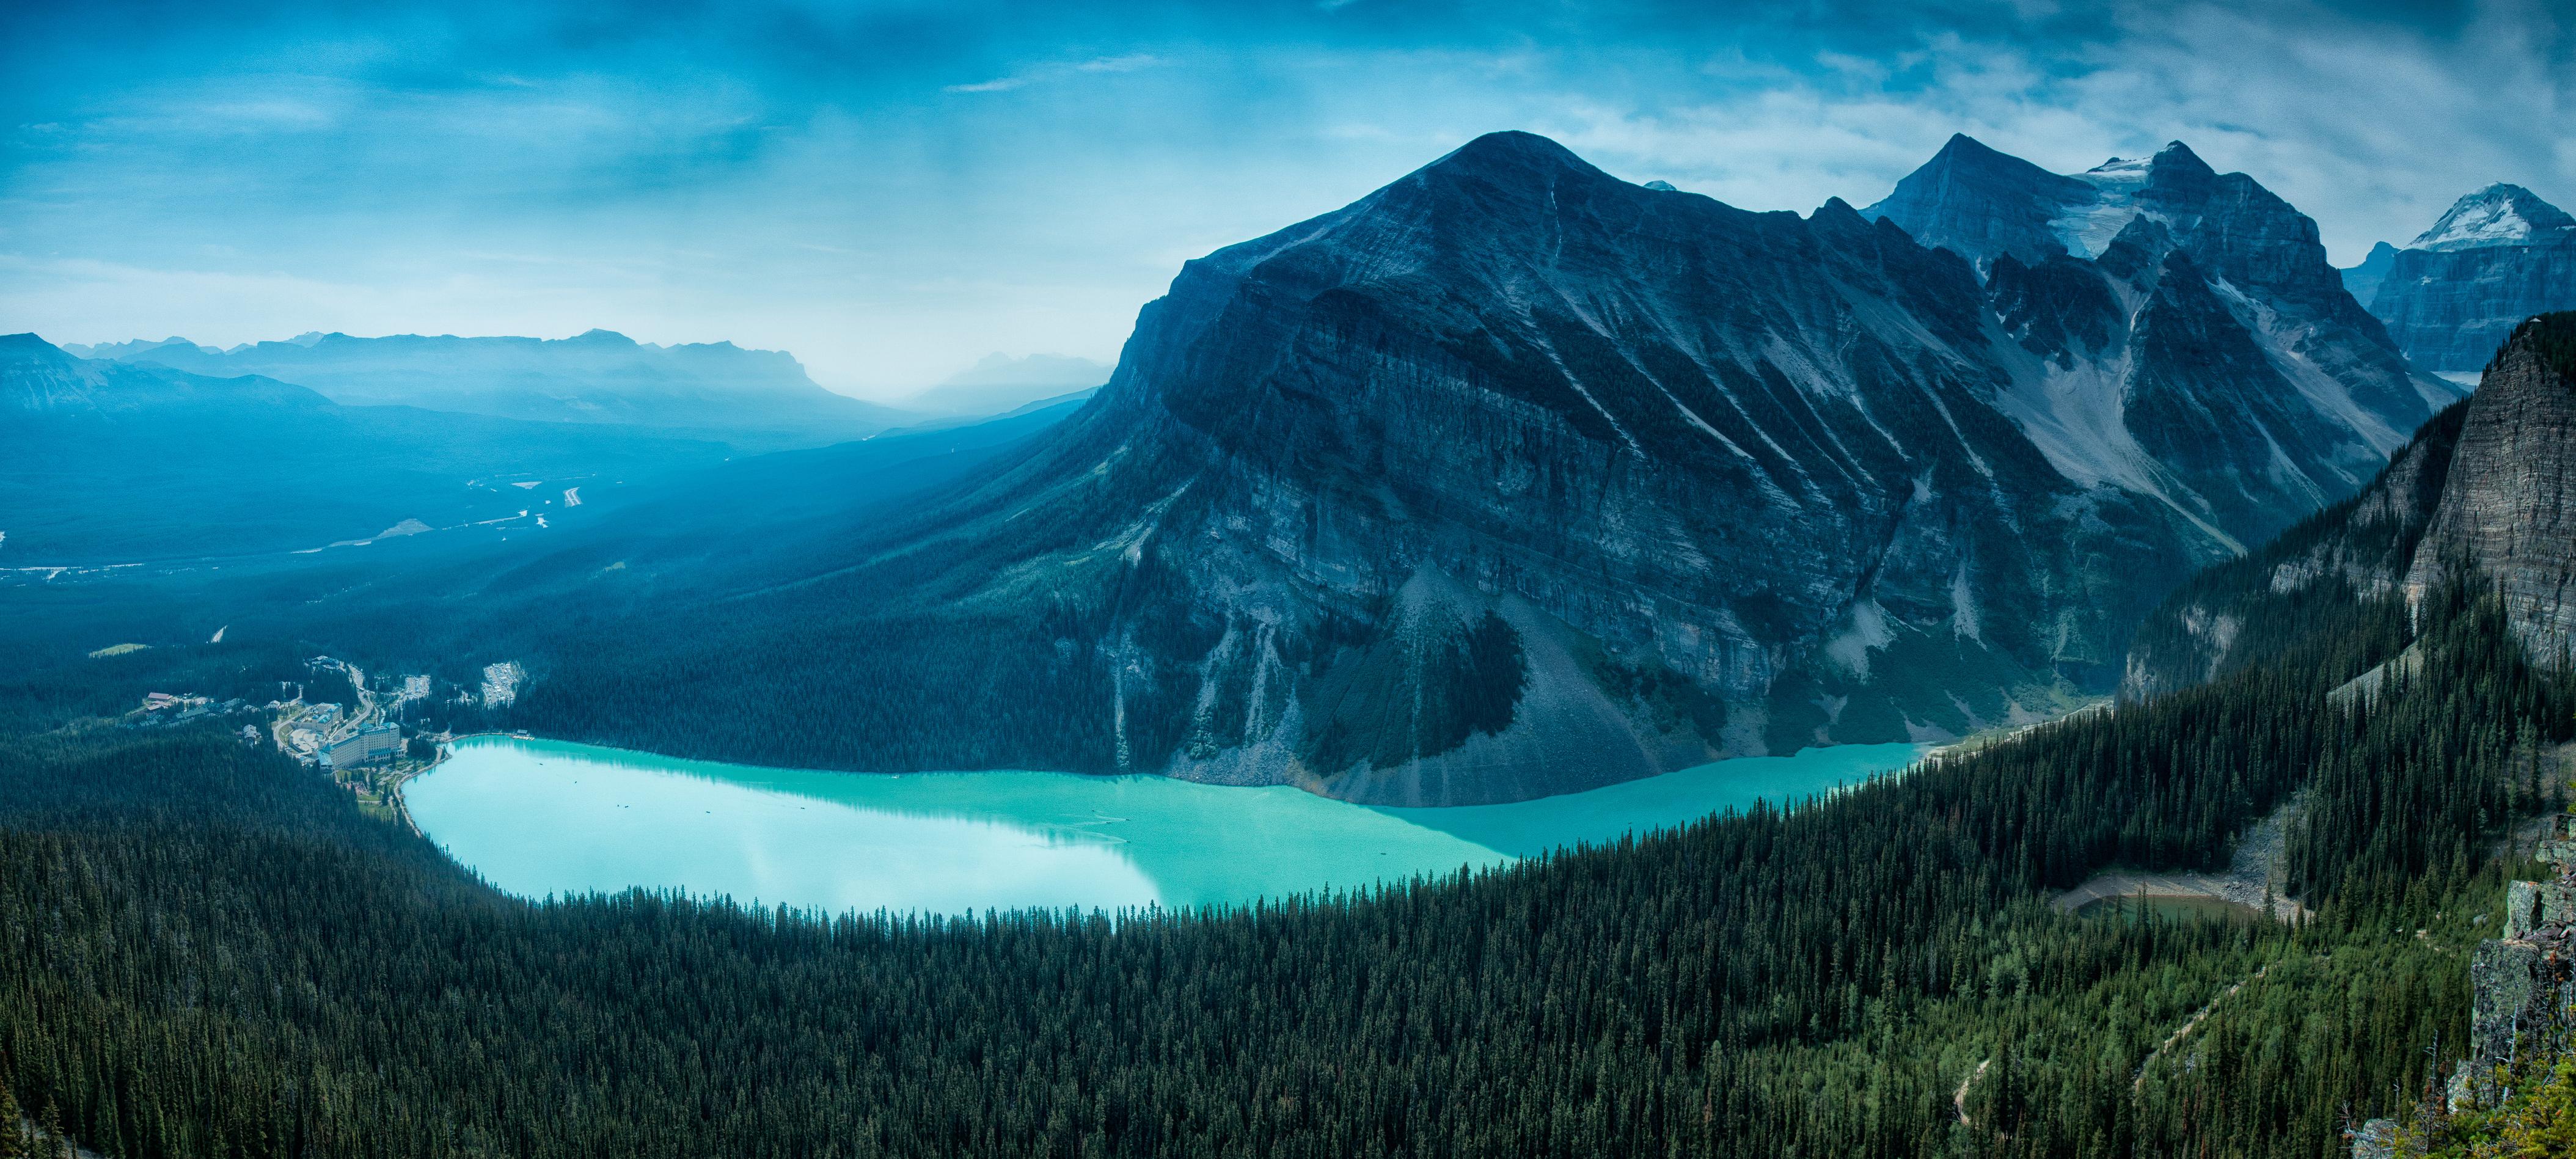 129507 4K Canadian Rockies Canada Lake Louise Banff 4216x1897